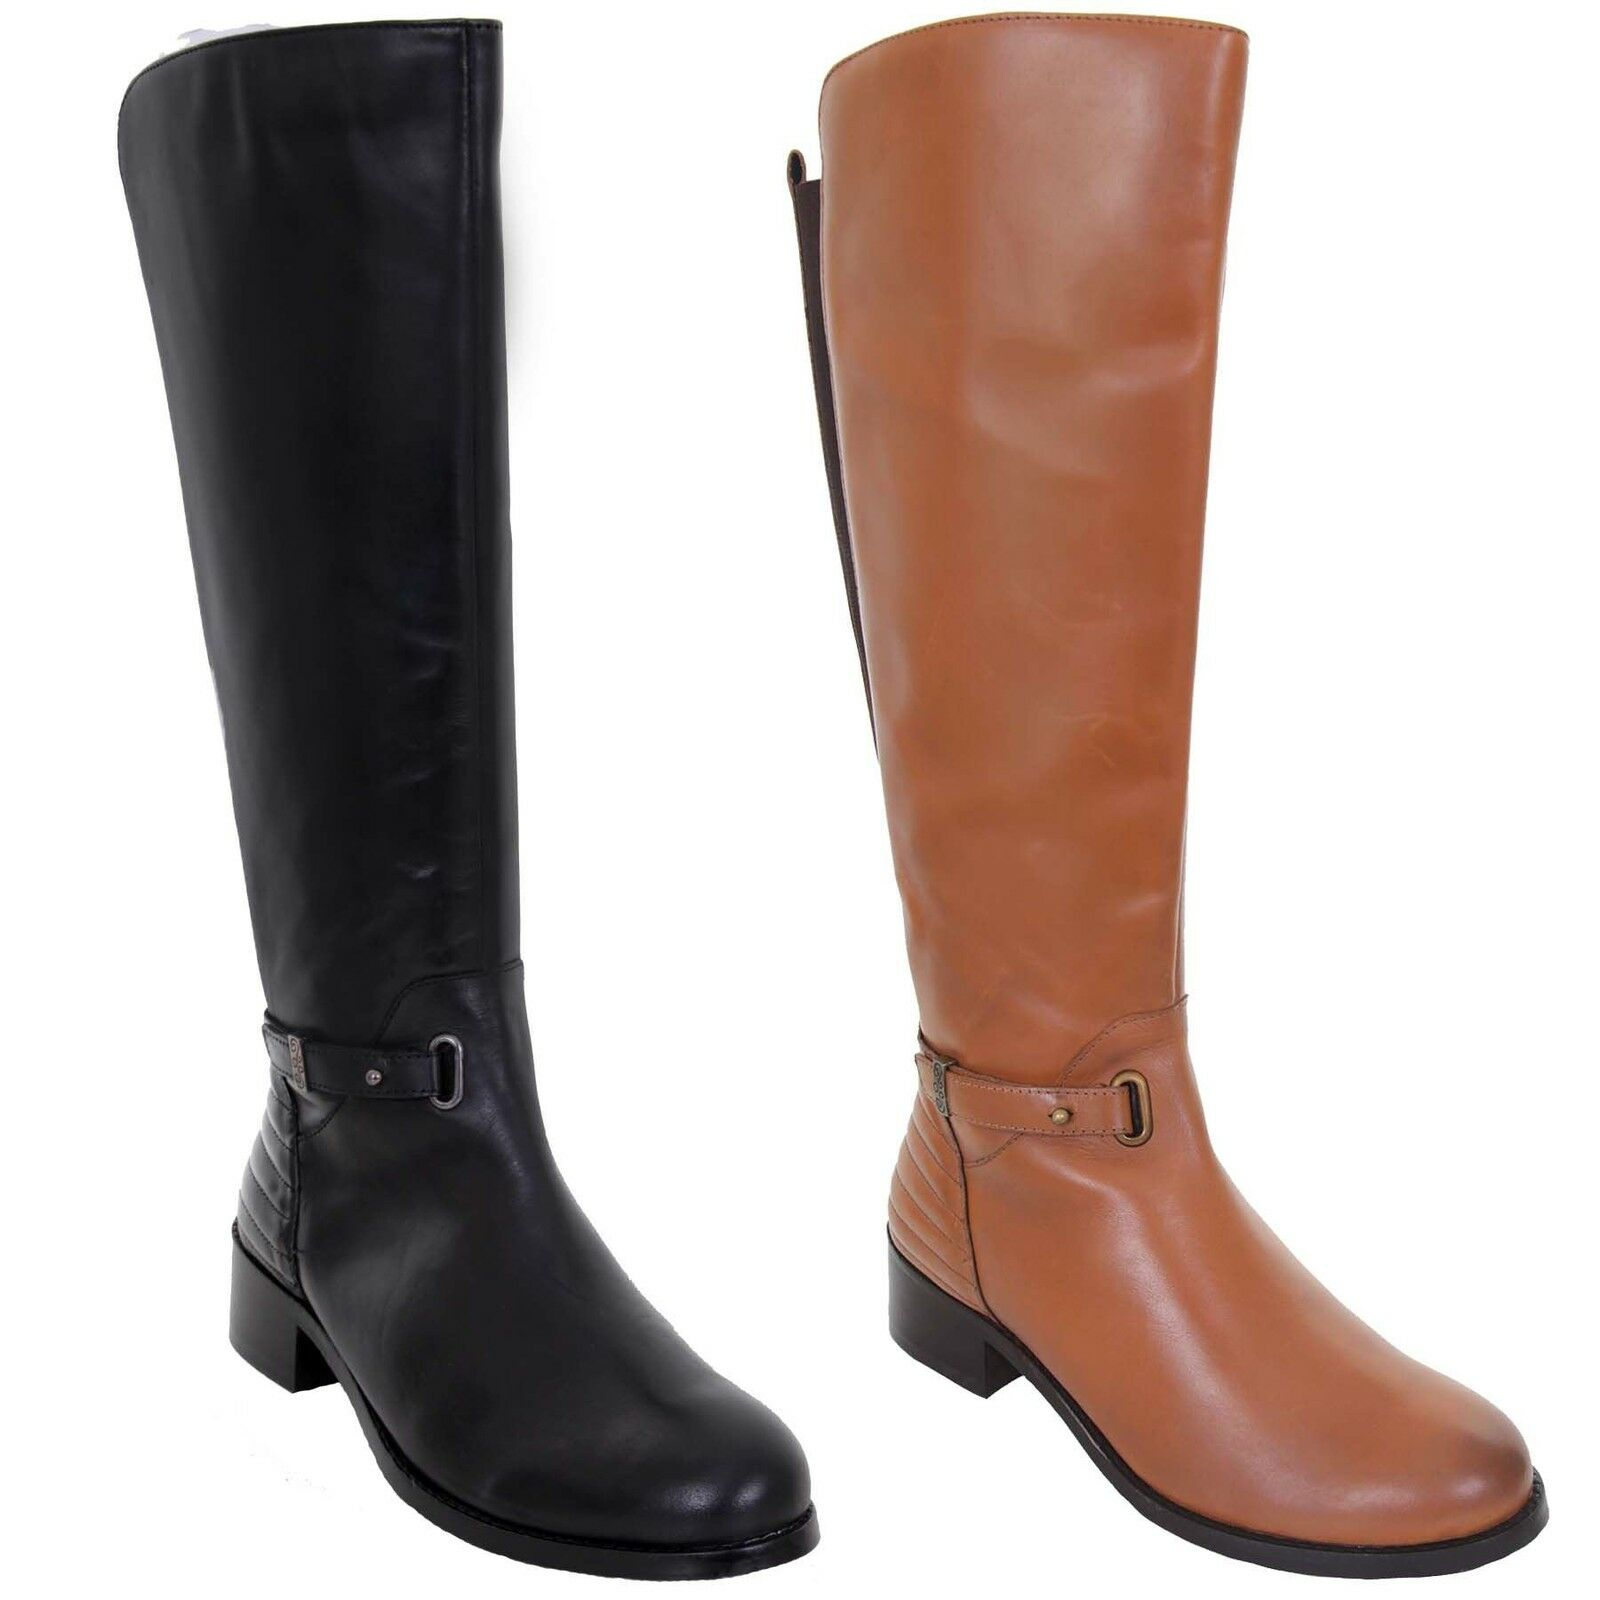 GLH472 Renoir Zipper Side Calf High Low Heel Elasticated Genuine Leather Boots